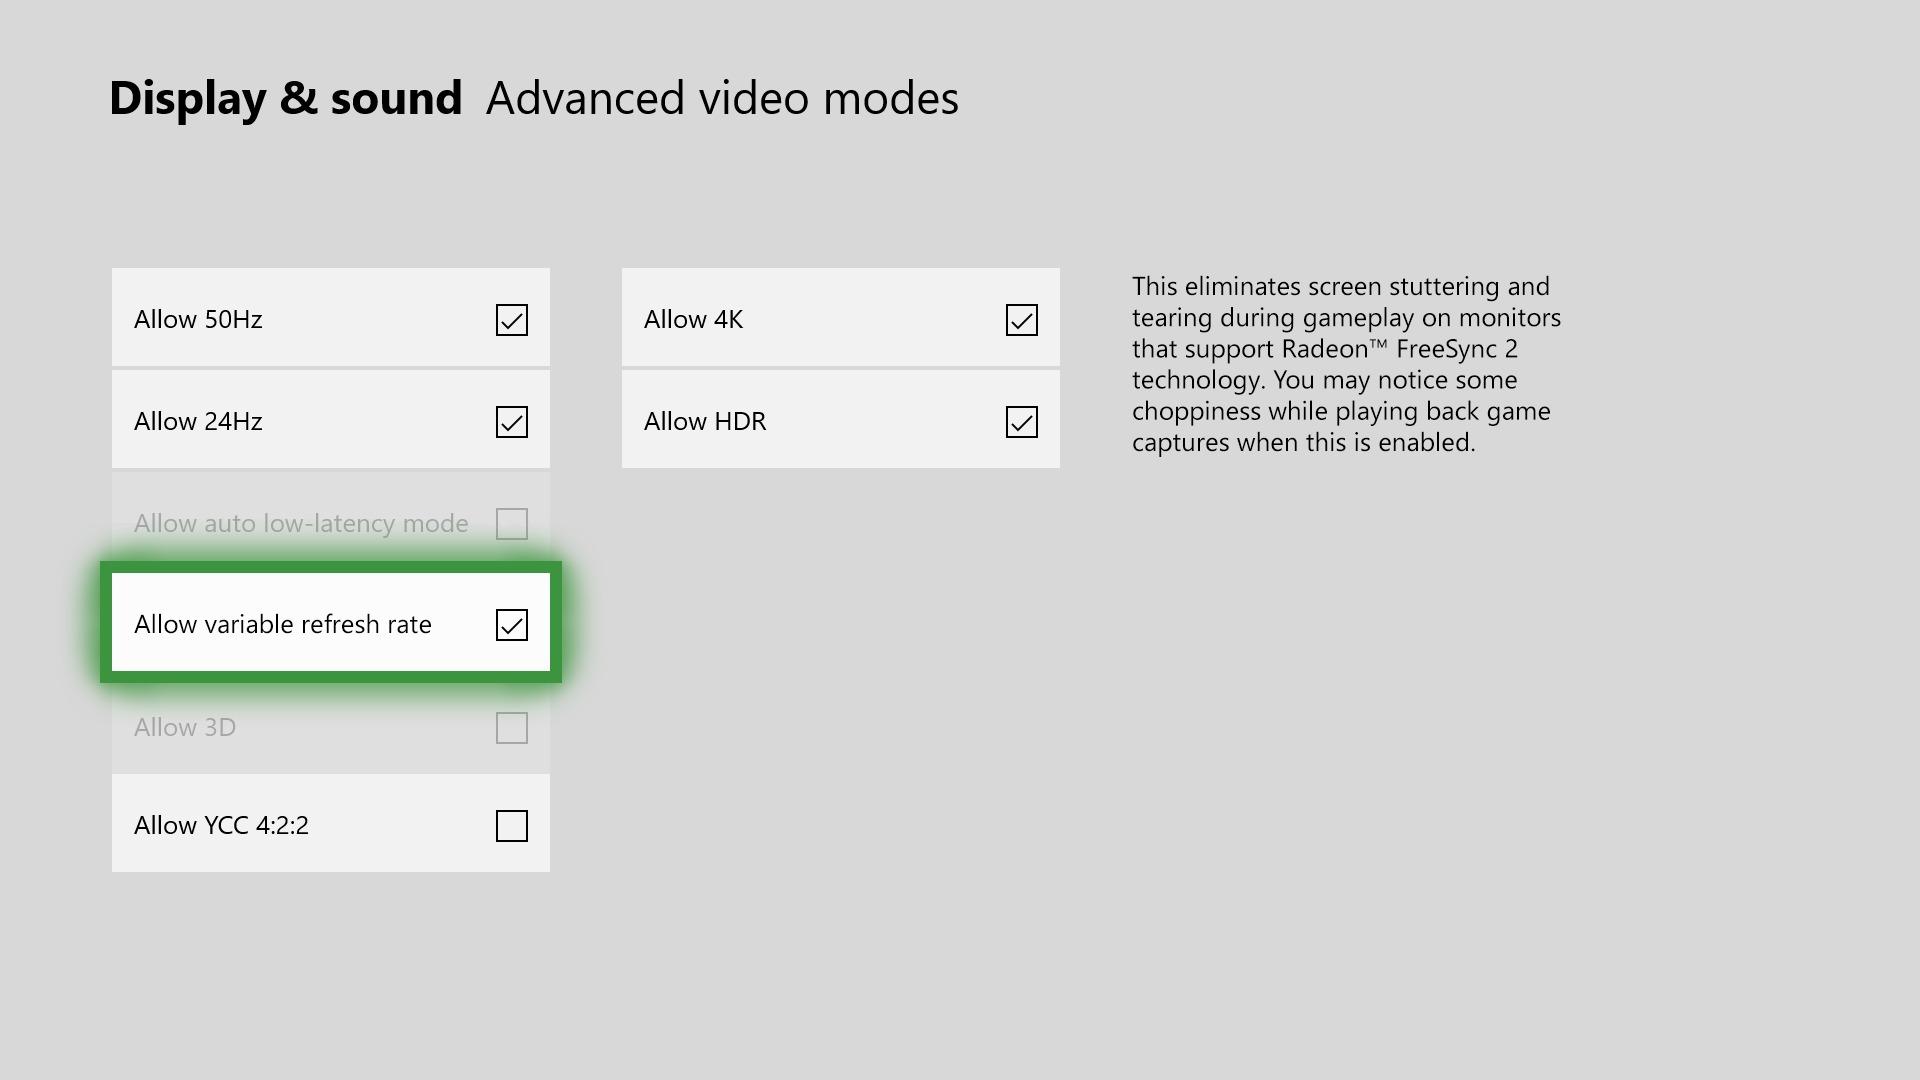 Xbox One Modo Juego